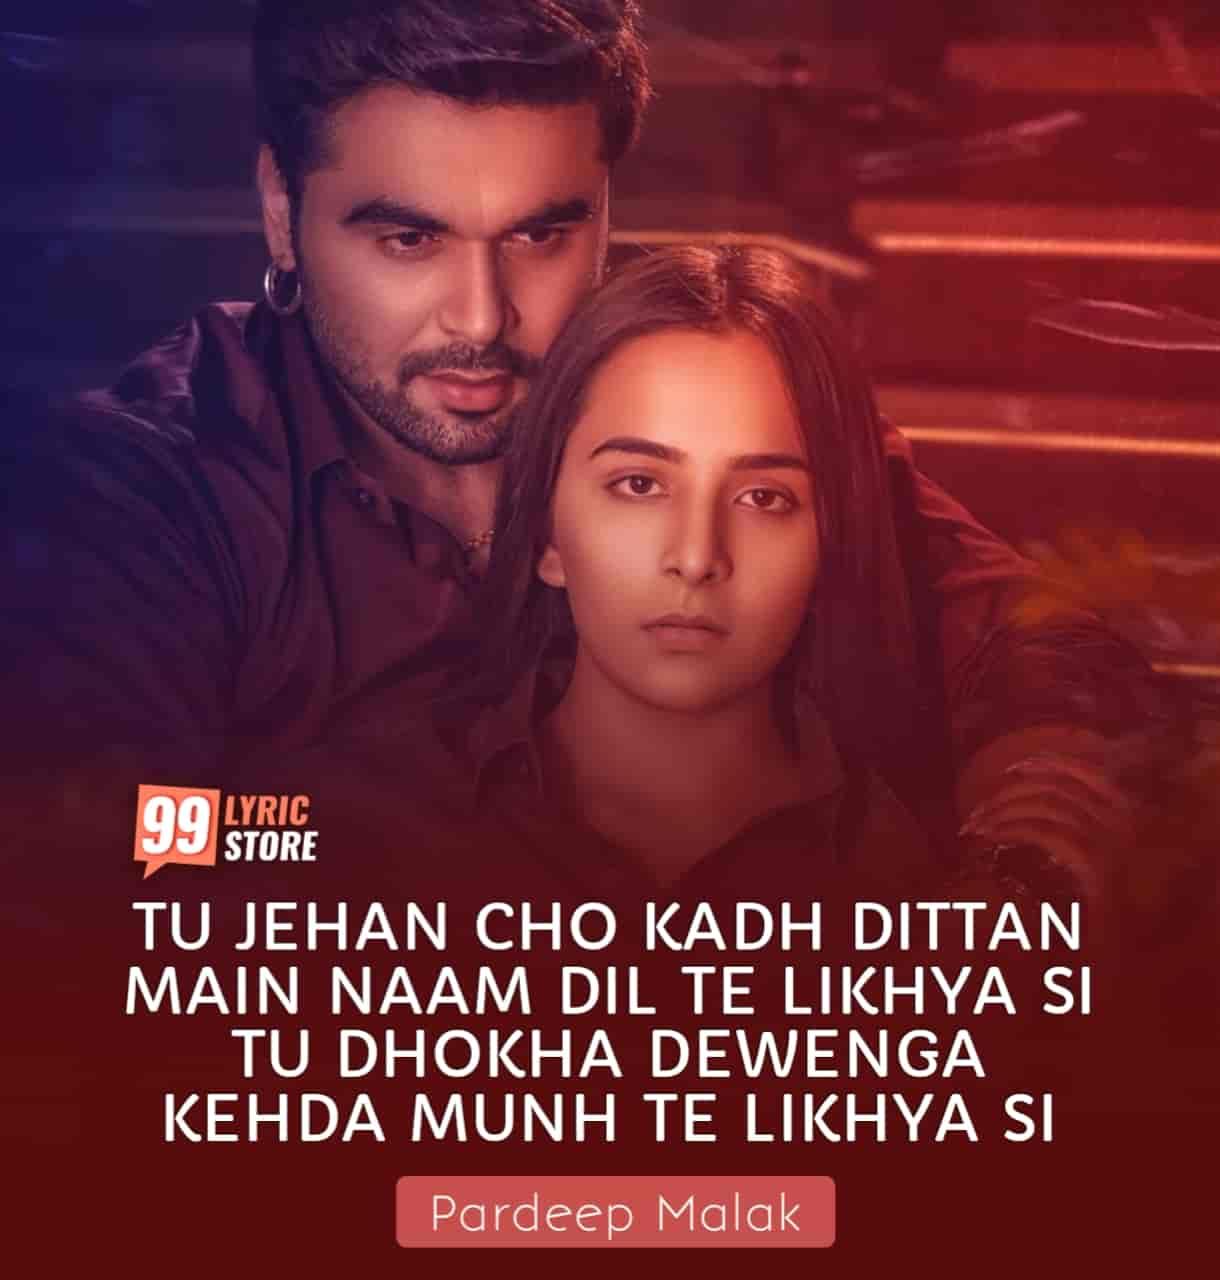 Dhokha Sad Punjabi Song Status Image By Ninja